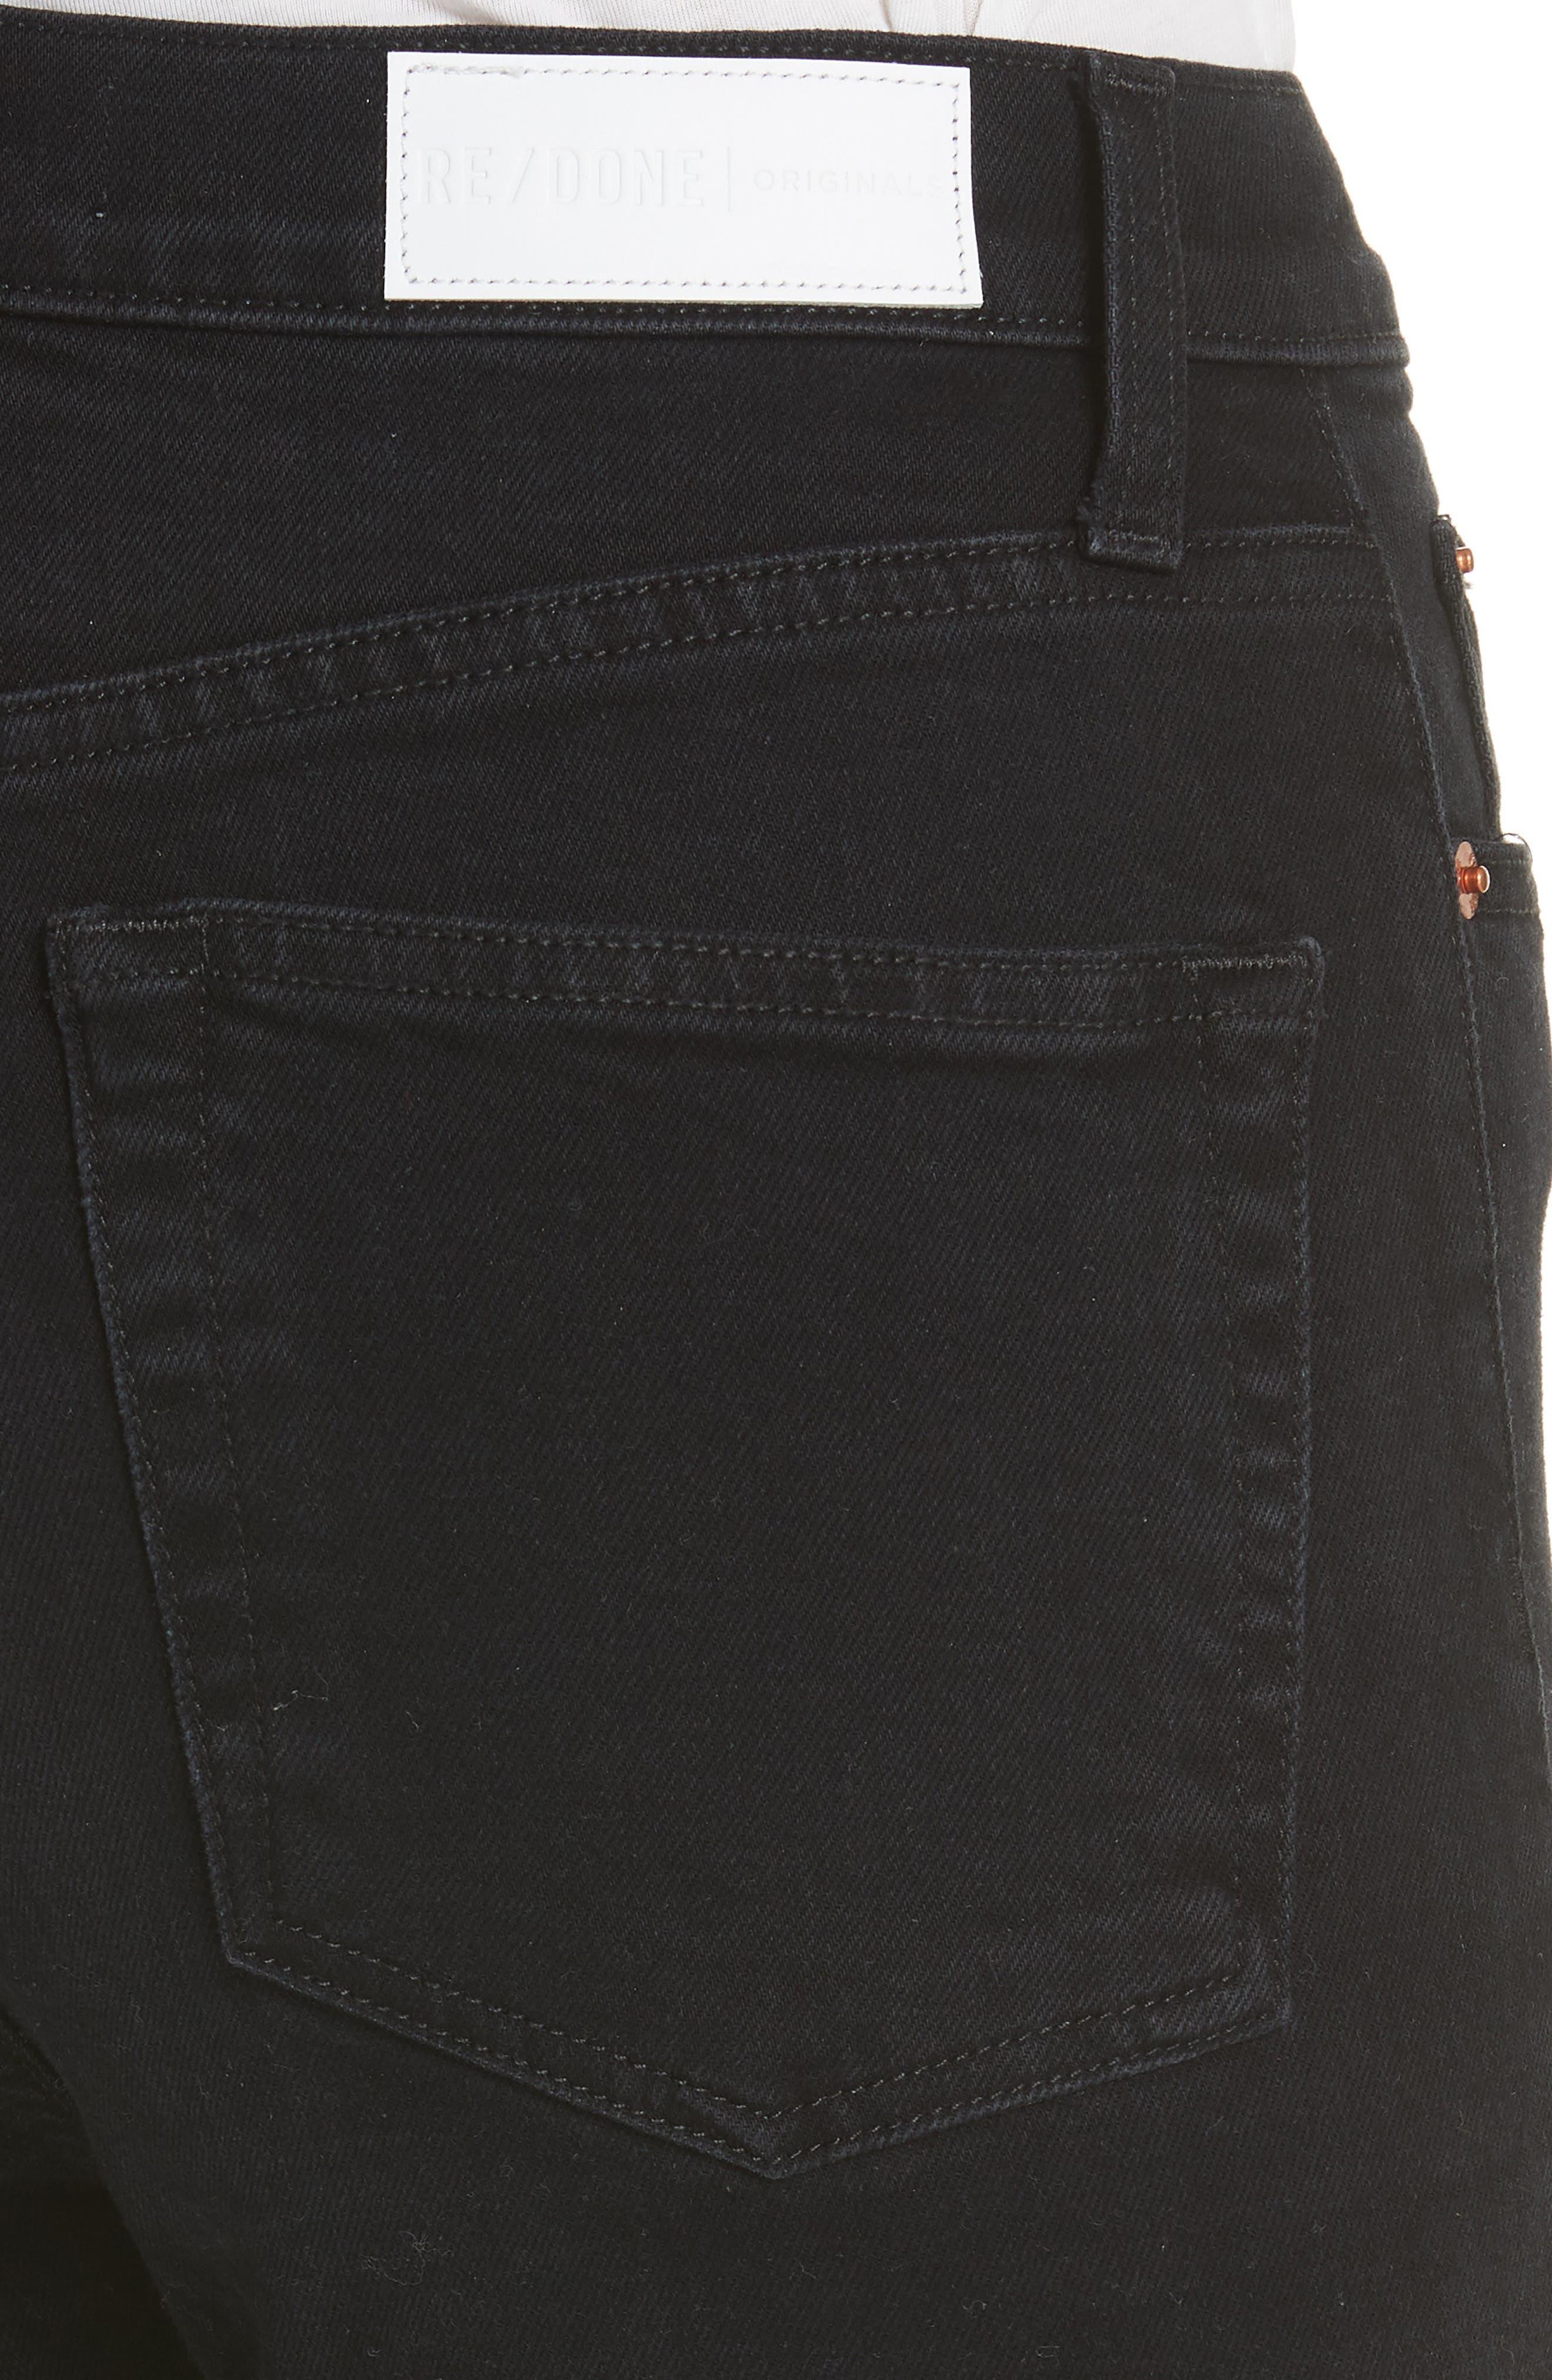 High Waist Stretch Ankle Jeans,                             Alternate thumbnail 4, color,                             BLACK DESTROY